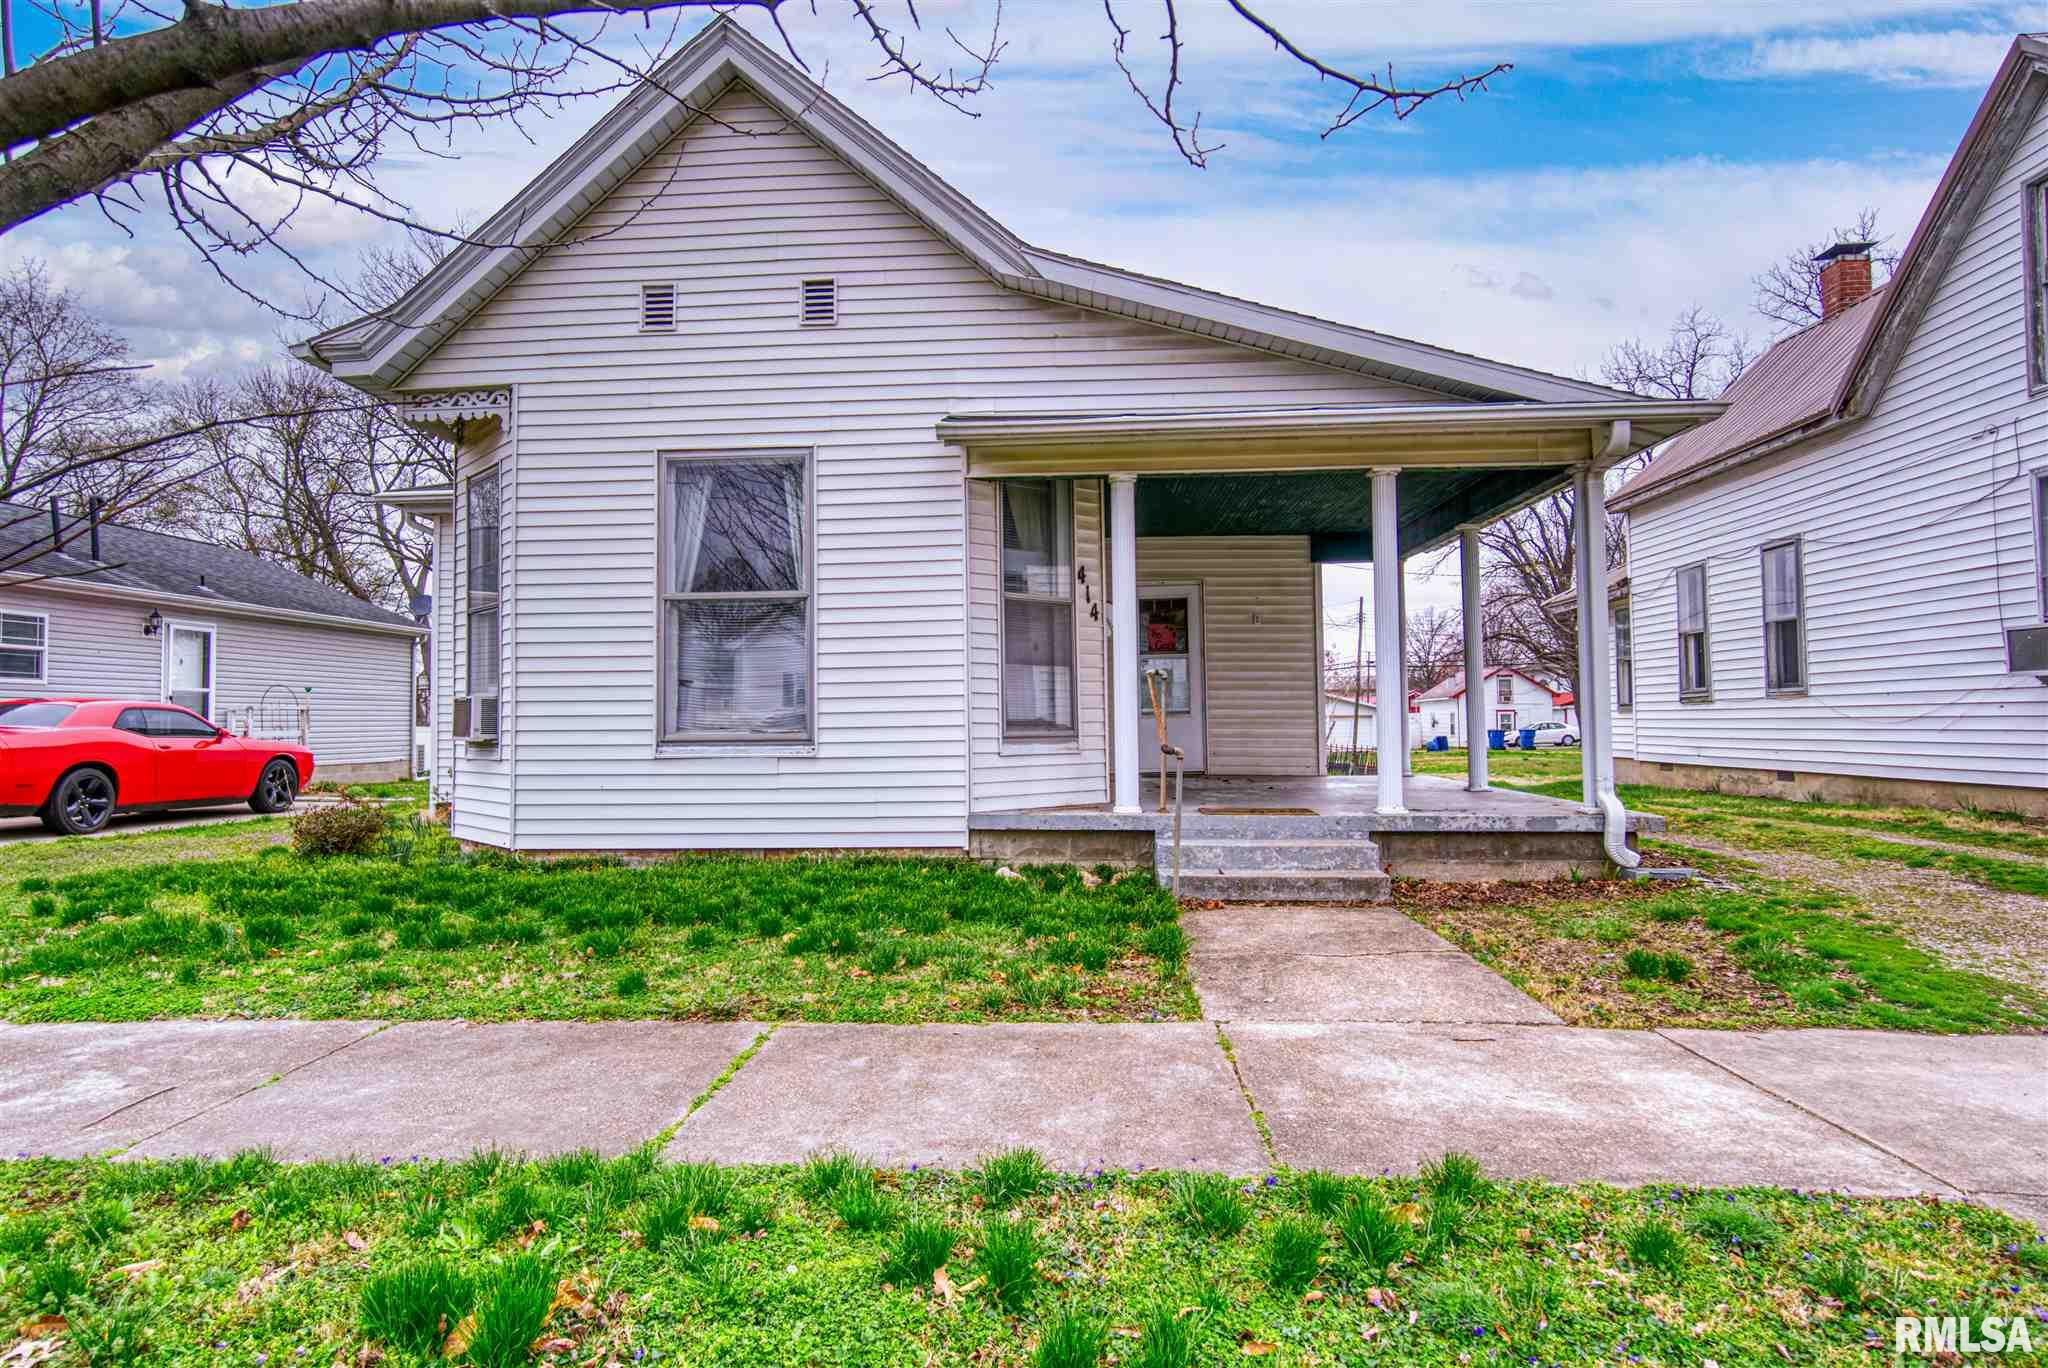 414 W 4TH Property Photo - Mt Carmel, IL real estate listing